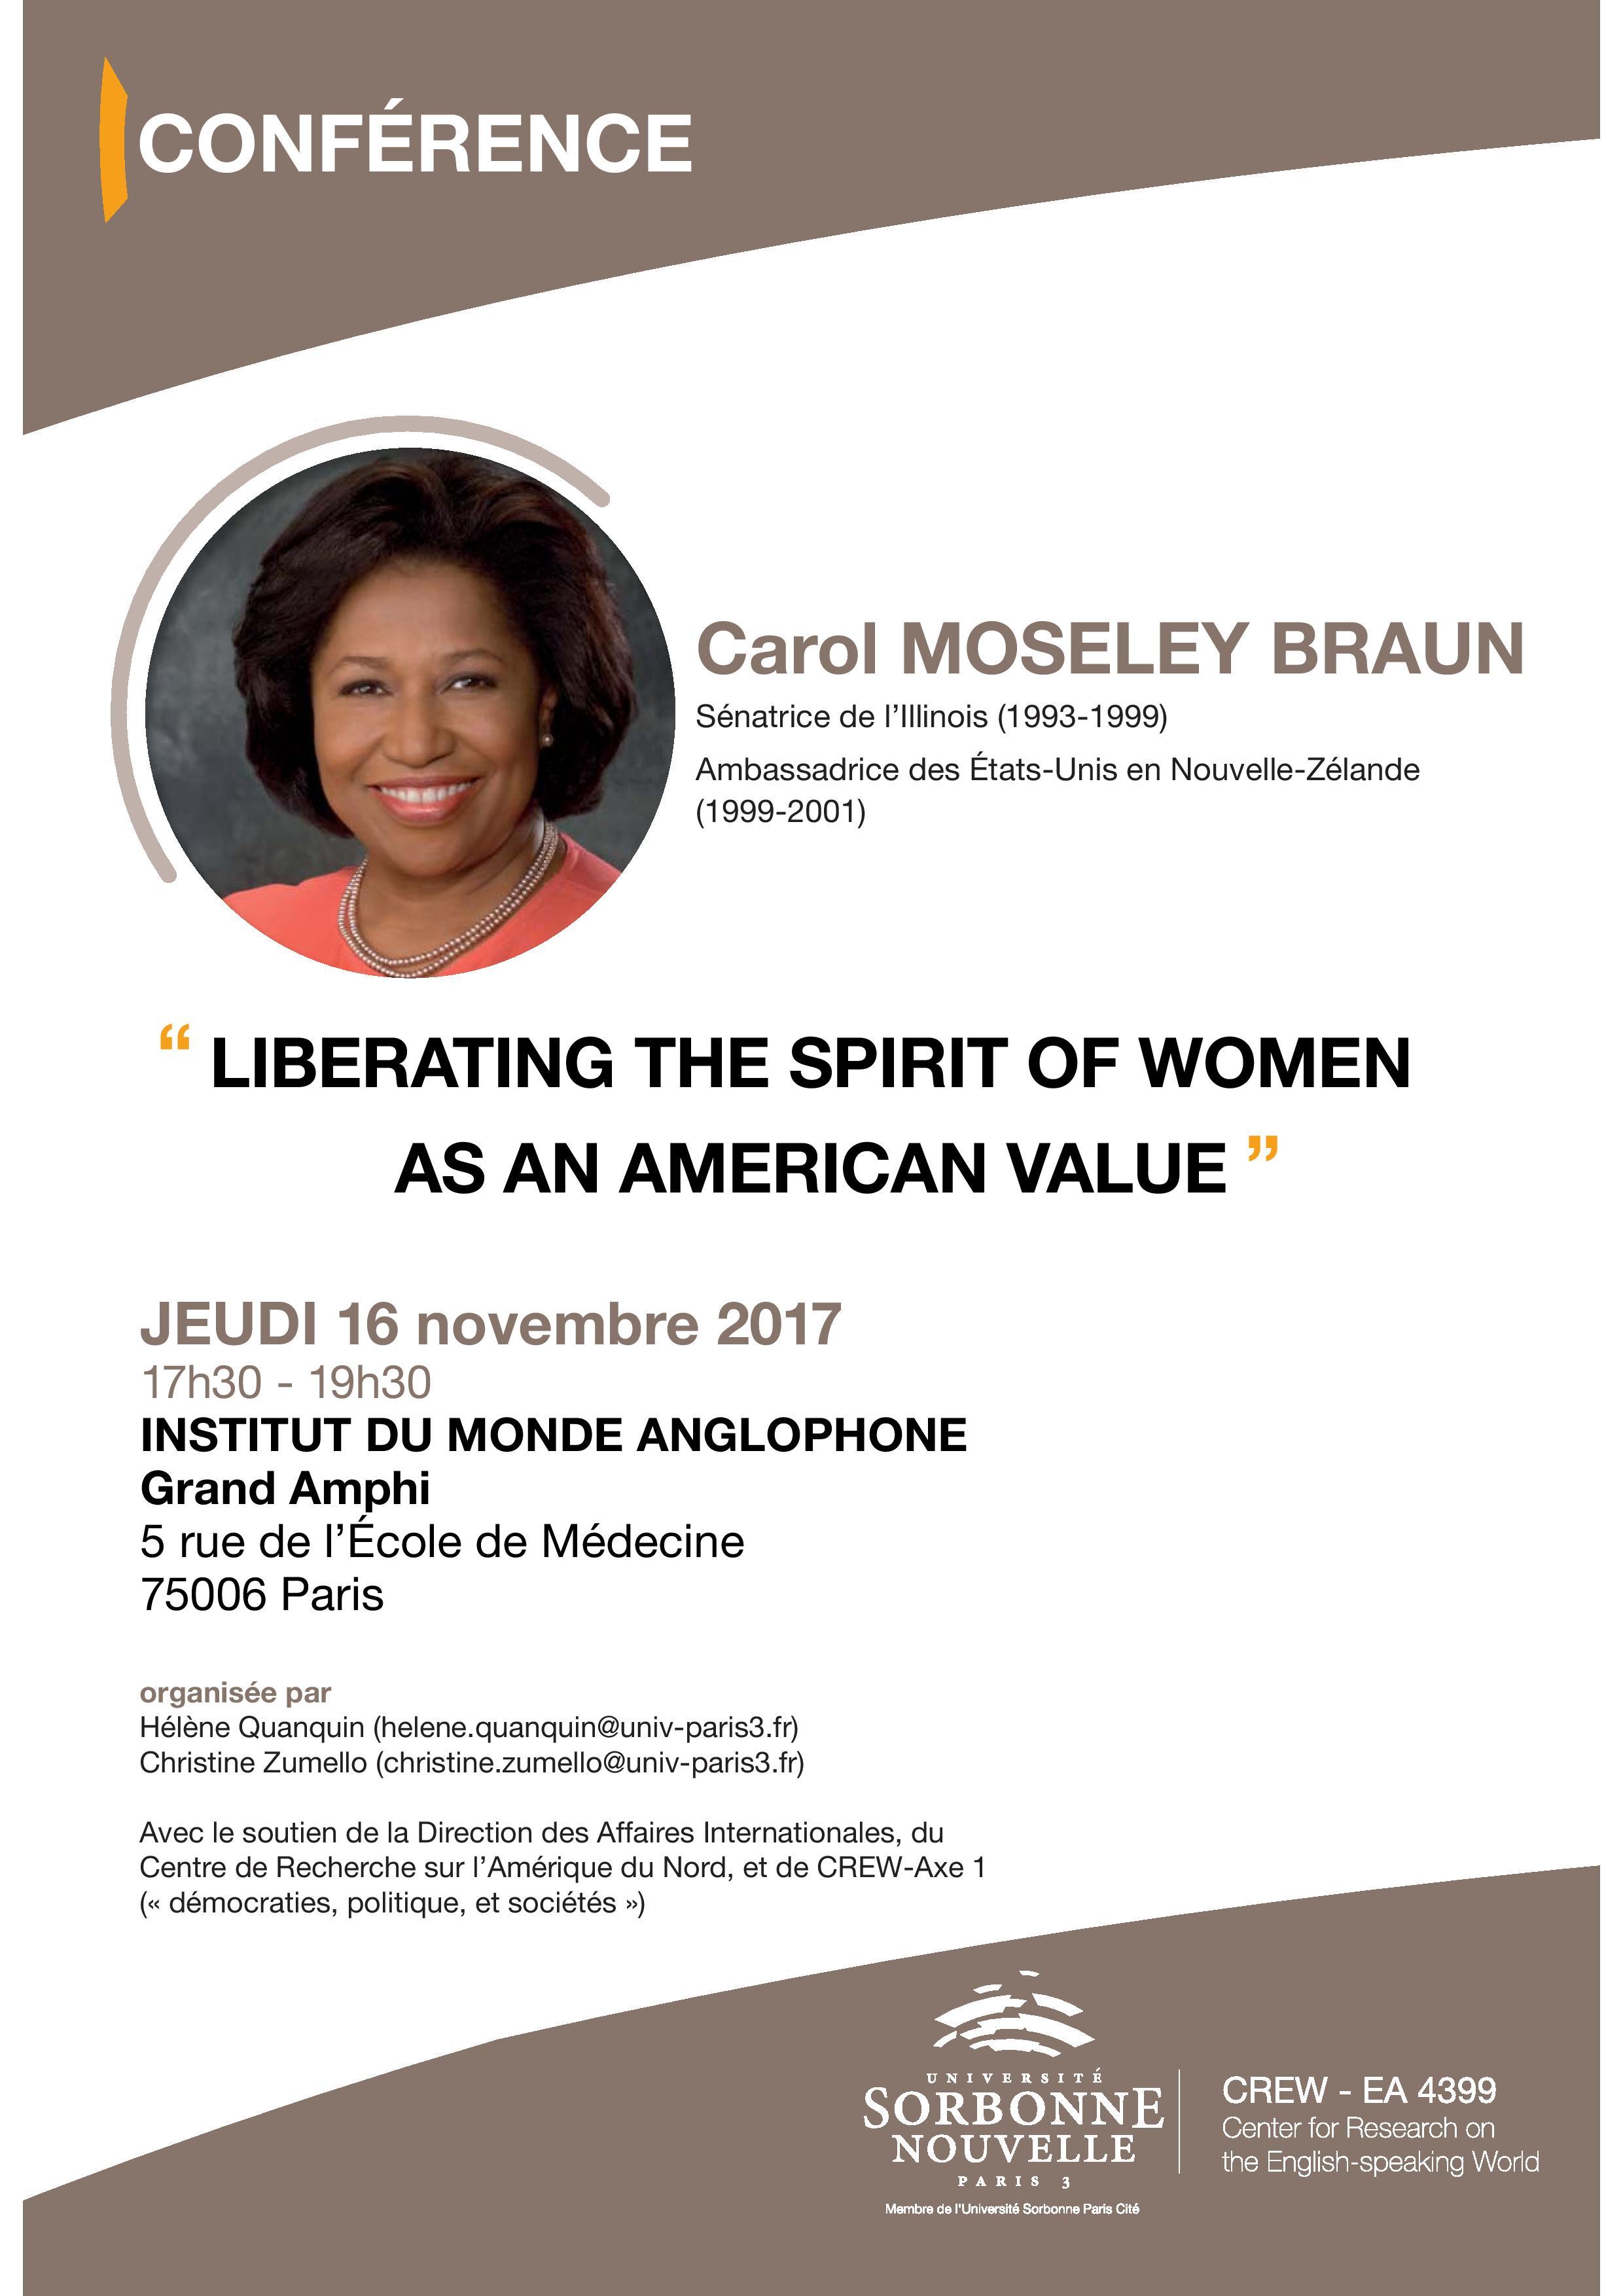 Conference_Carol_Moseley_Braun-2-page-001.jpg